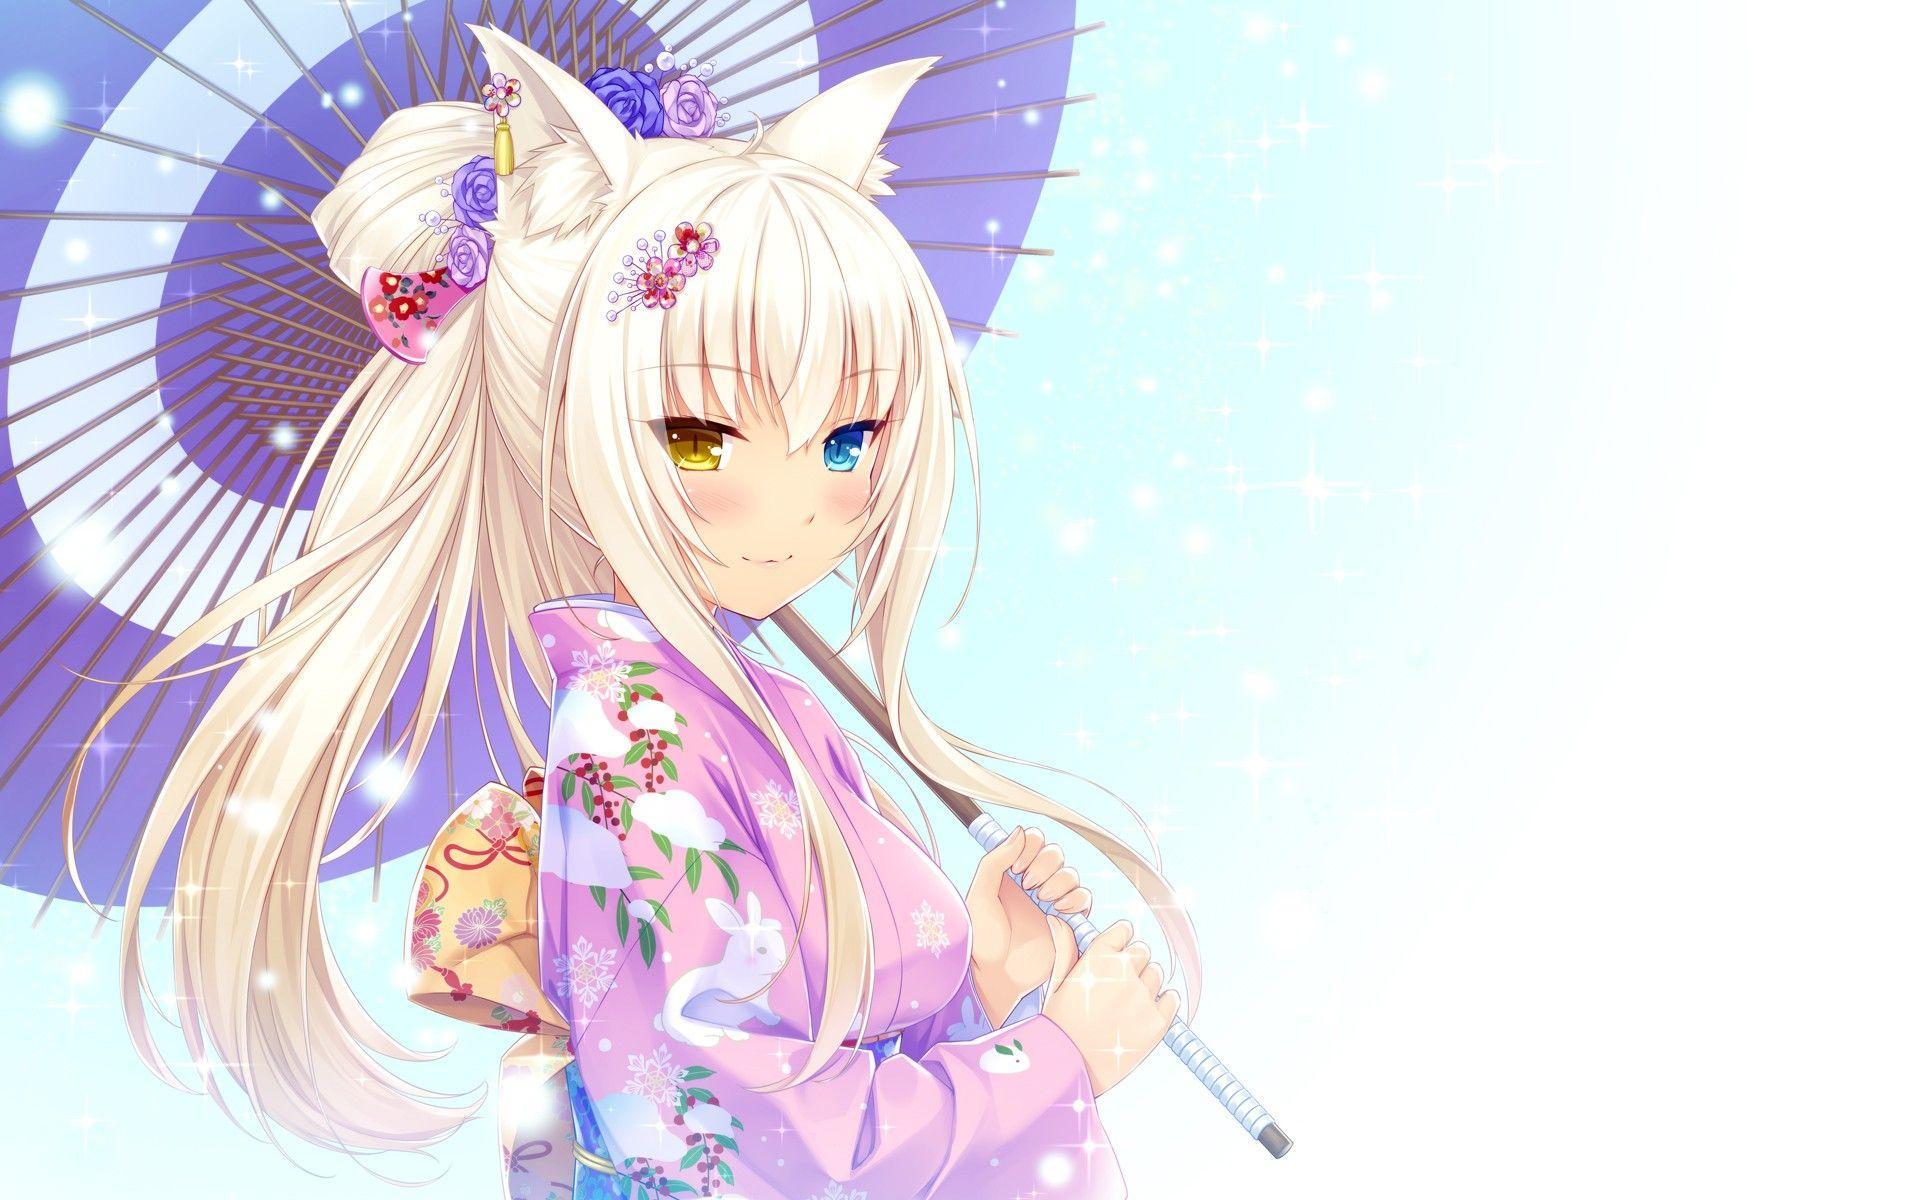 Cute Anime Neko Girls Wallpapers Top Free Cute Anime Neko Girls Backgrounds Wallpaperaccess